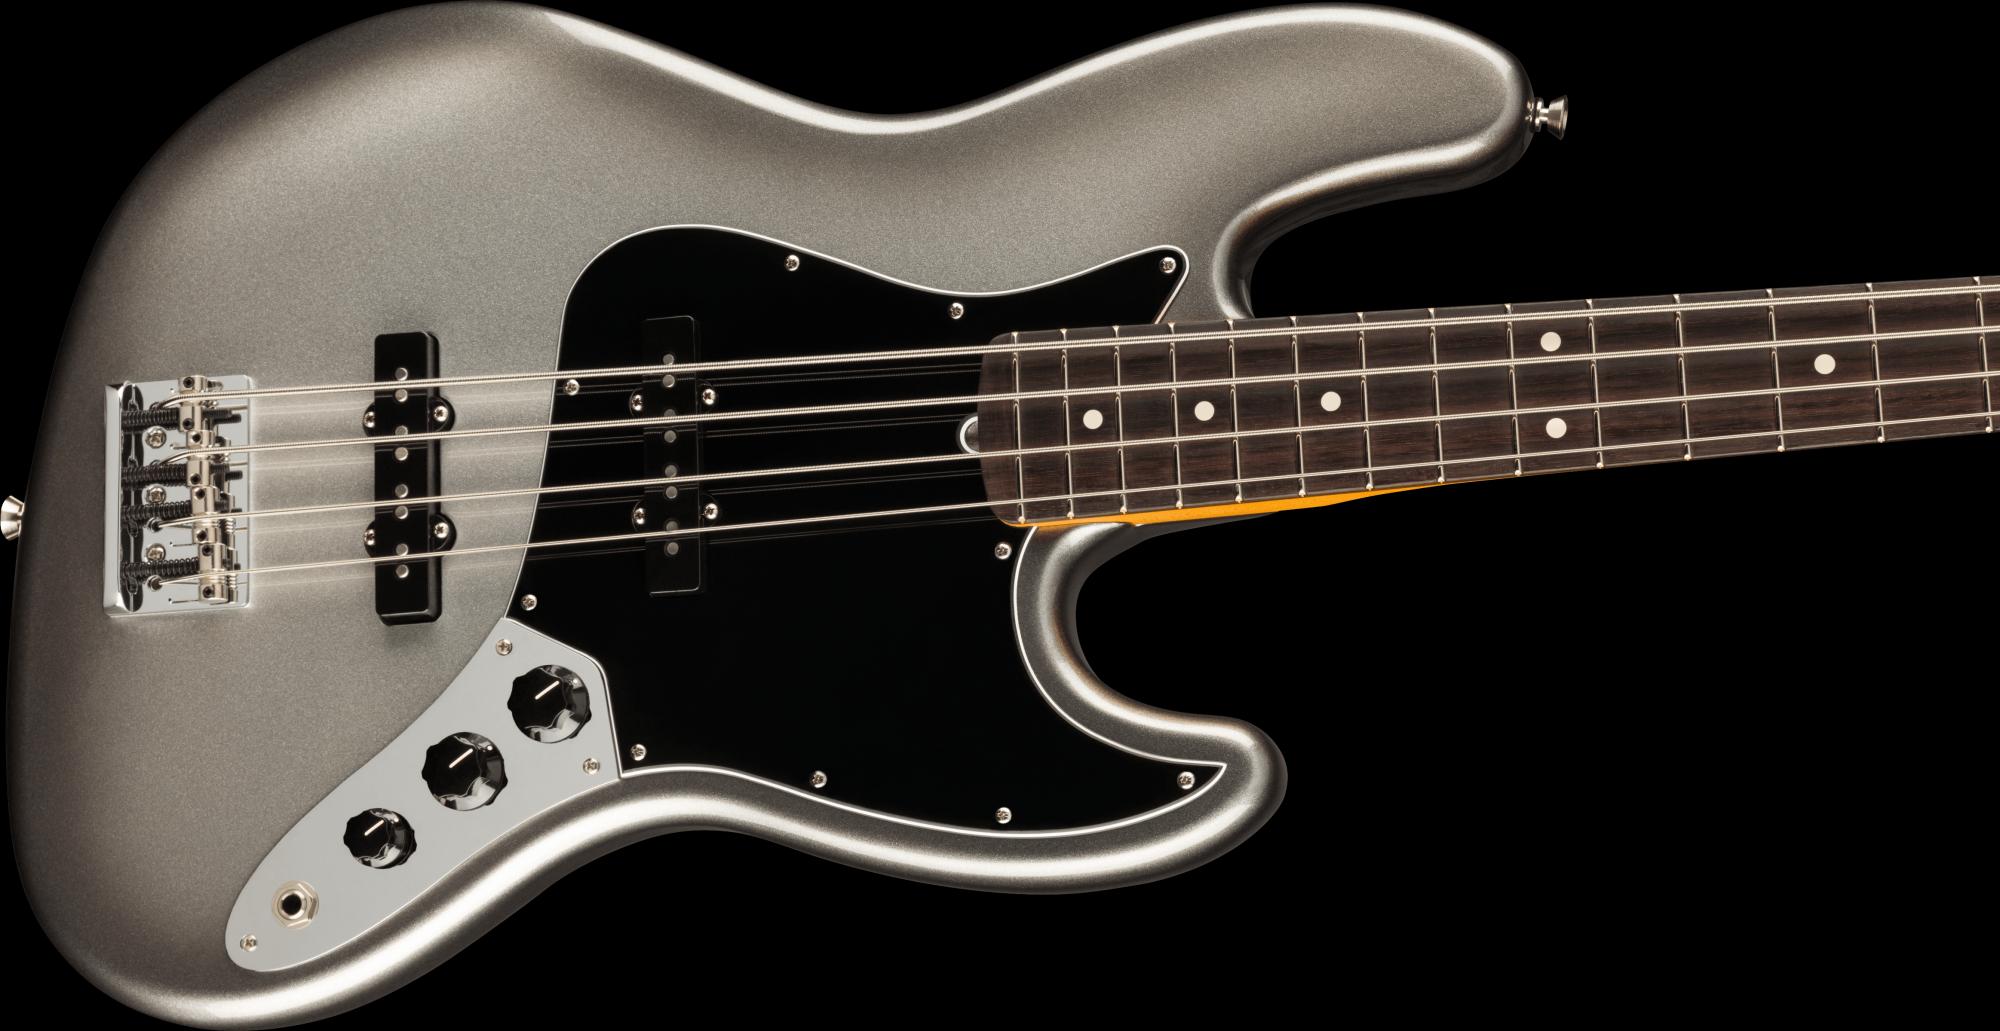 Fender American Professional II Jazz Bass Rosewood Fingerboard - Mercury